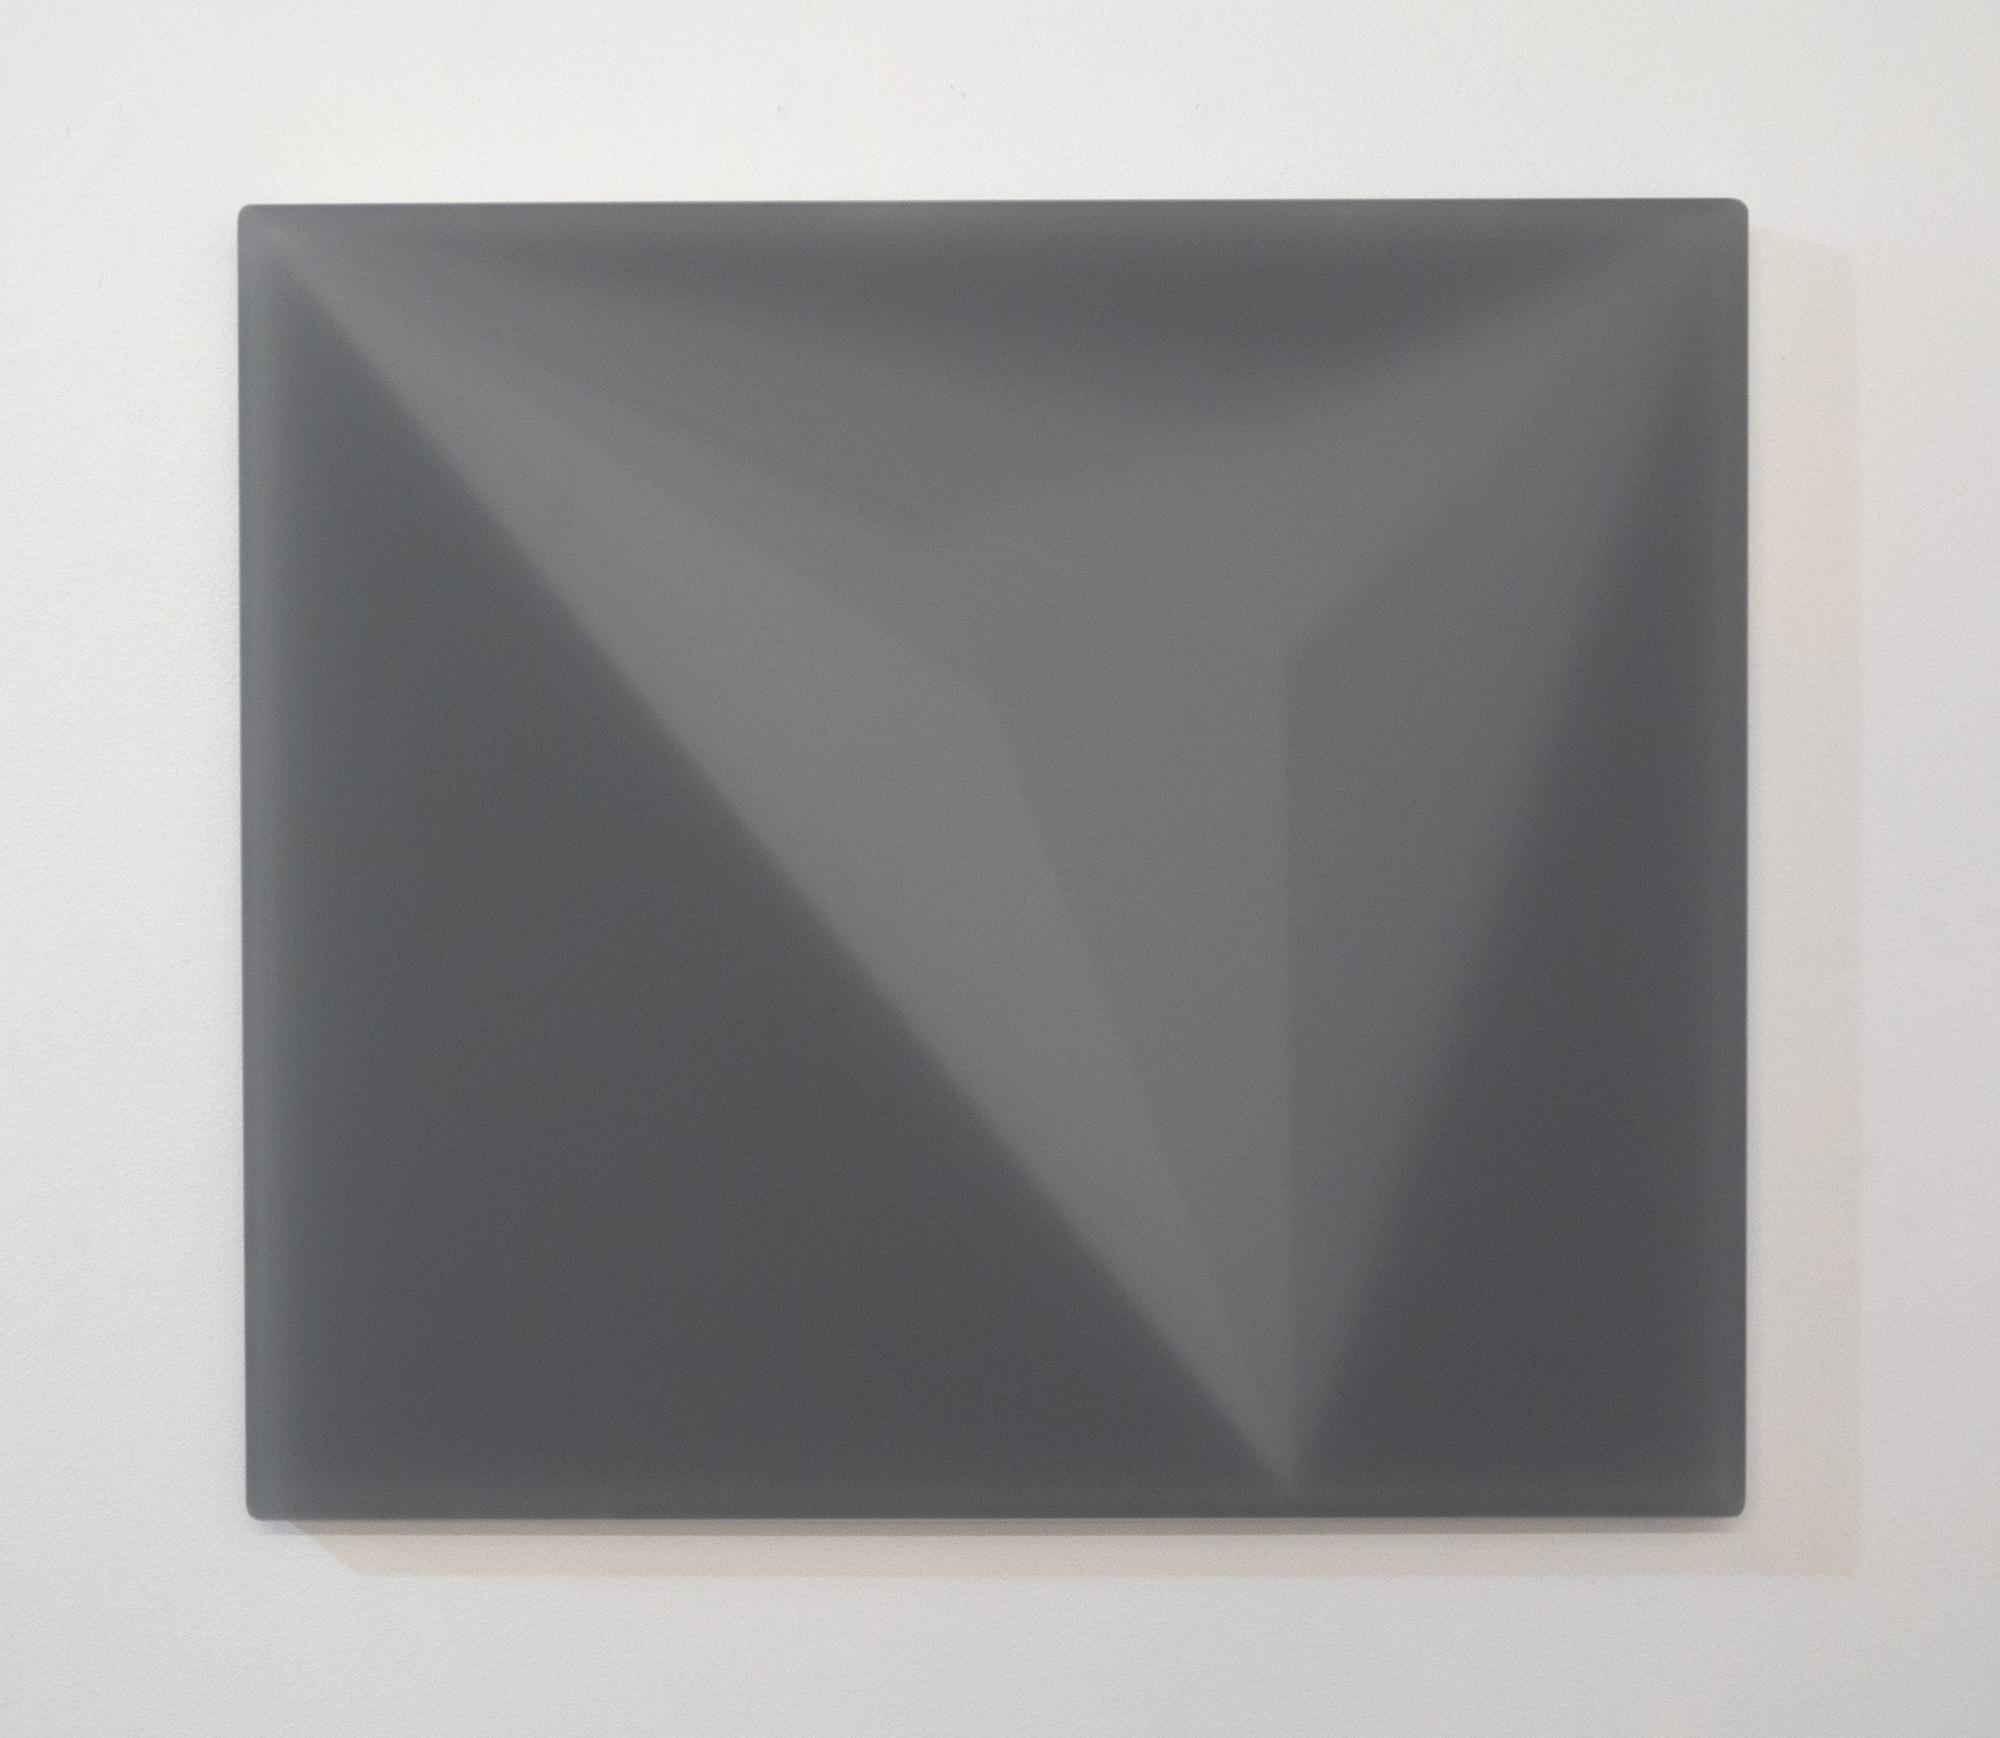 Karyn Taylor, Platonics of Solid IV, 2017, cast acrylic, pvc, 42 x 48 x 2.5cm.jpg